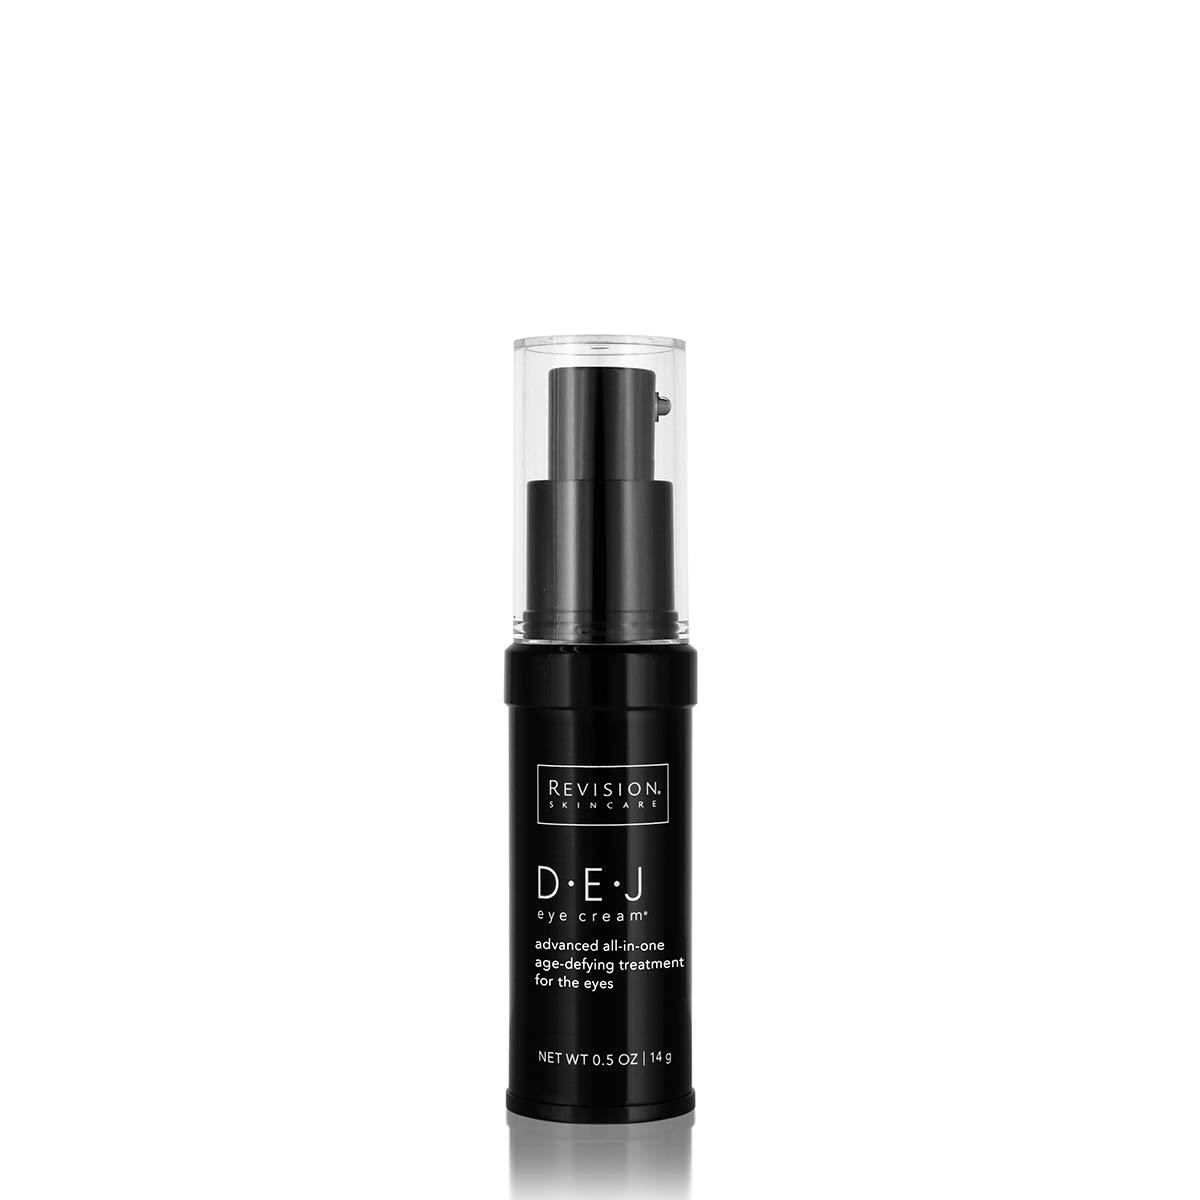 Revision Skincare D.E.J. Eye Cream, 0.5 oz by Revision Skincare